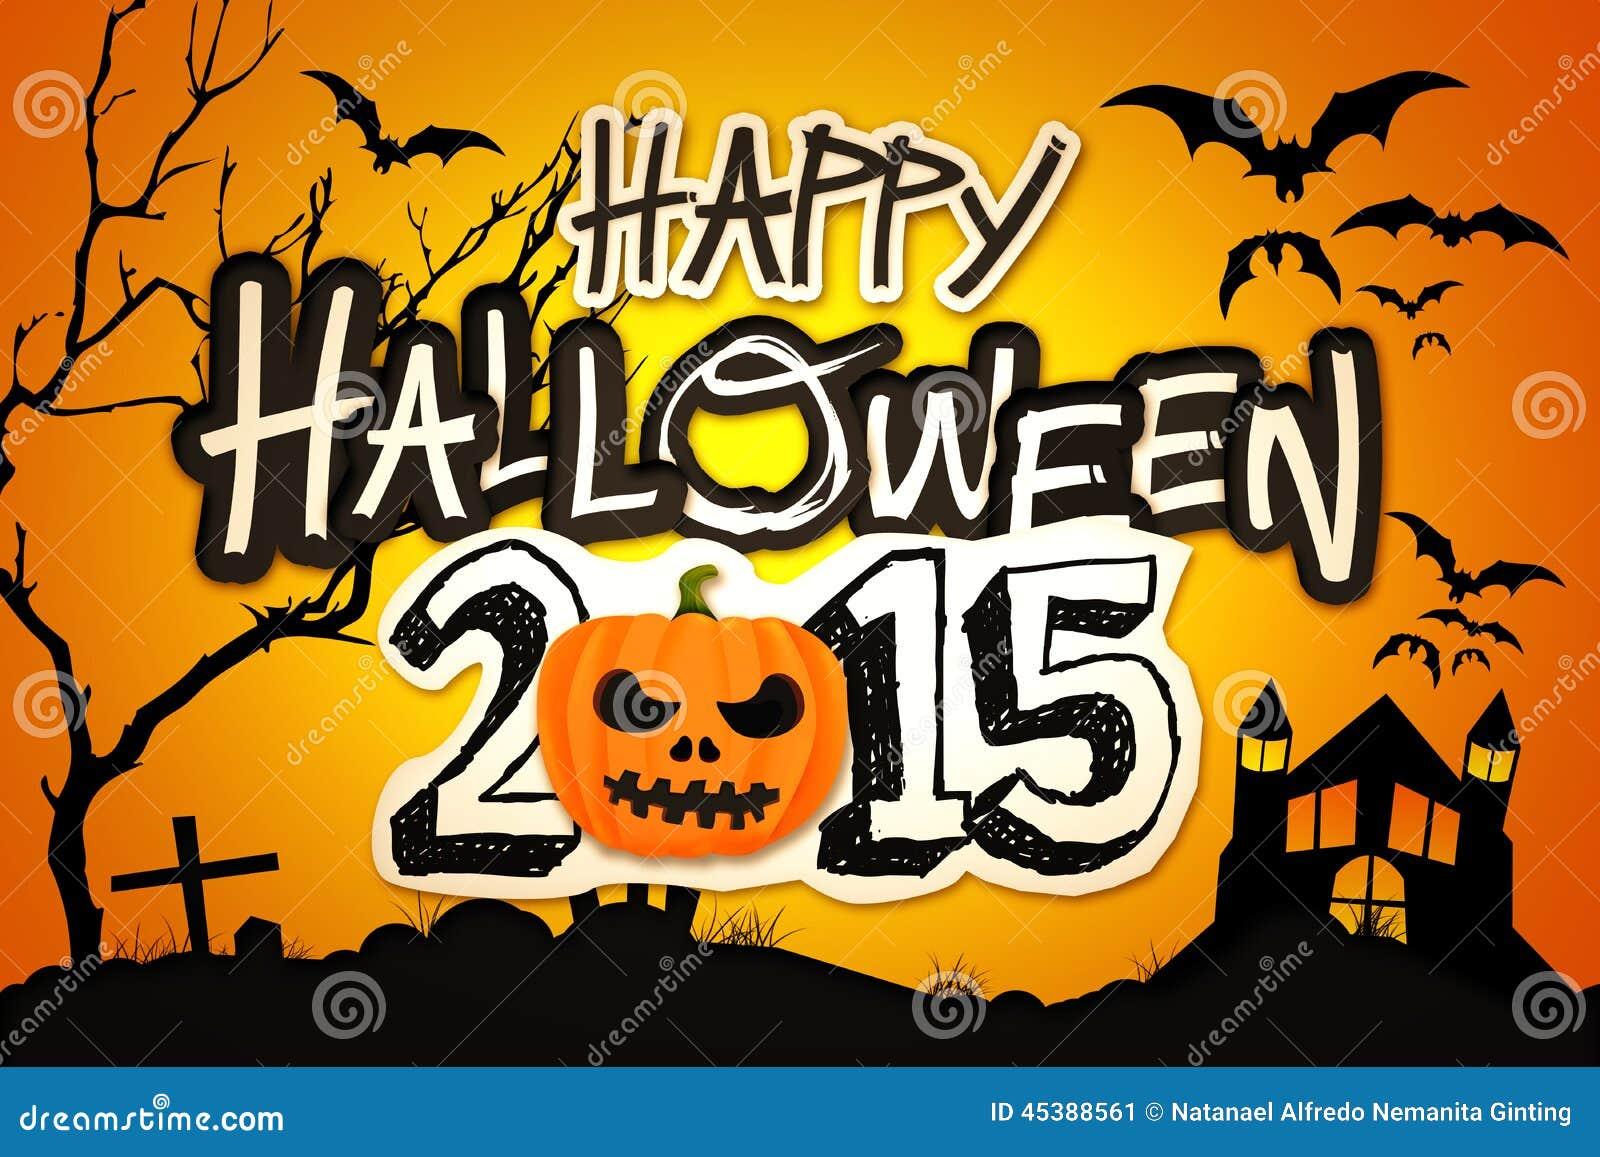 ... Orange Pumpkin Night Graveyard Stock Illustration - Image: 45388561